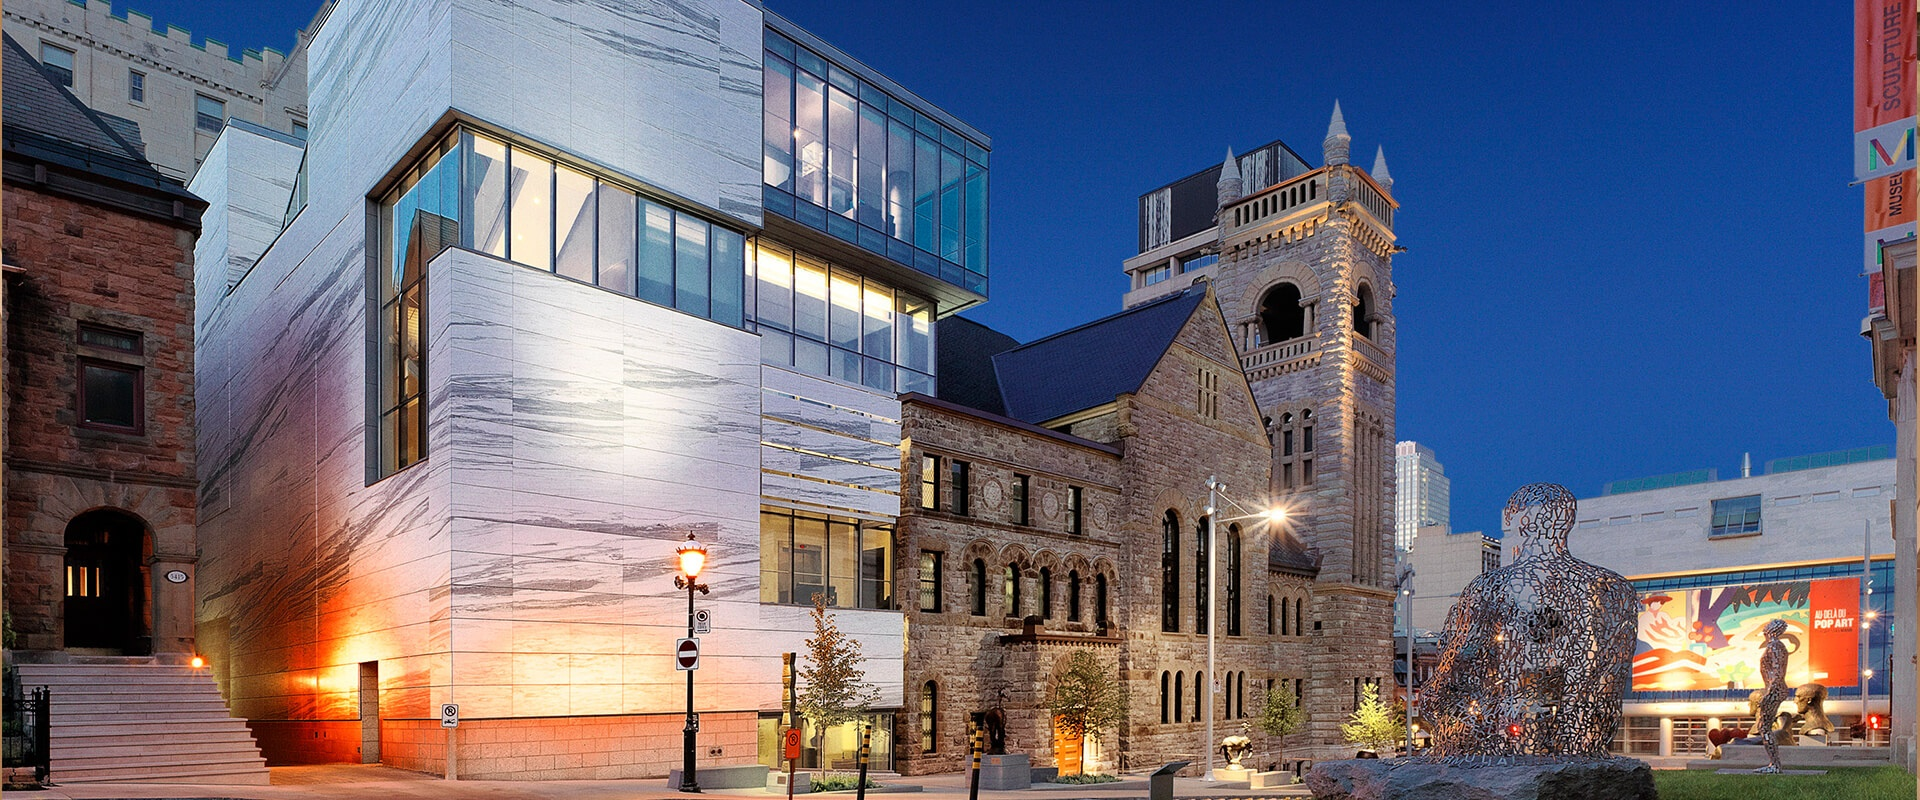 Montreal Museum of Fine Arts 1